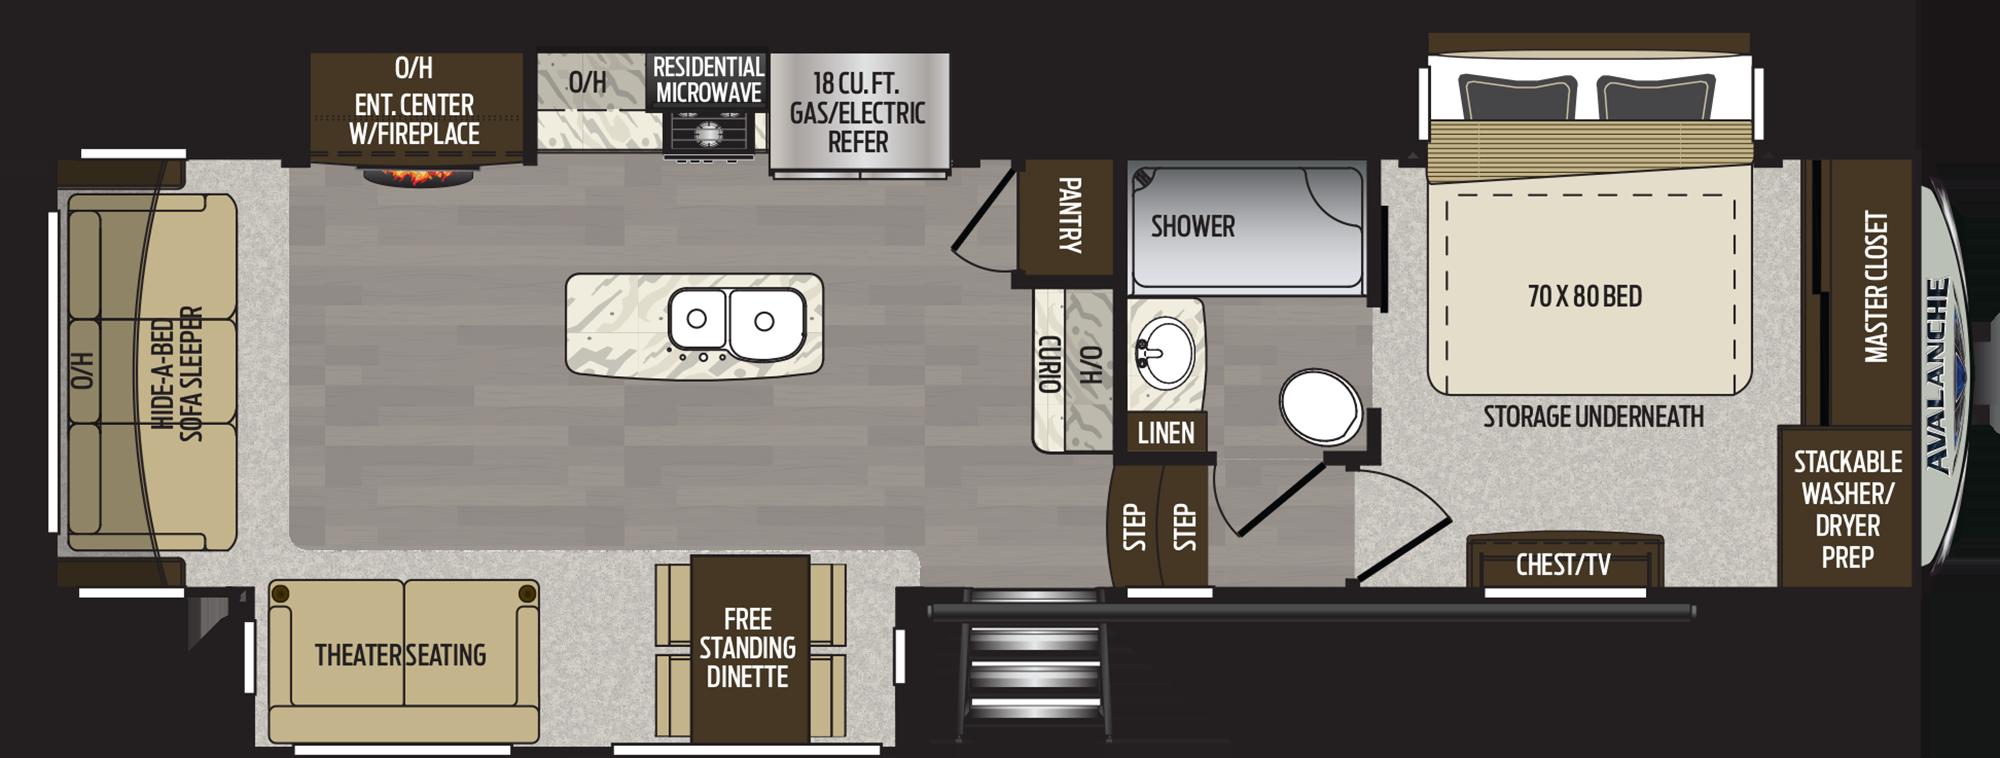 2019 KEYSTONE AVALANCHE 320RS (couples) Floorplan